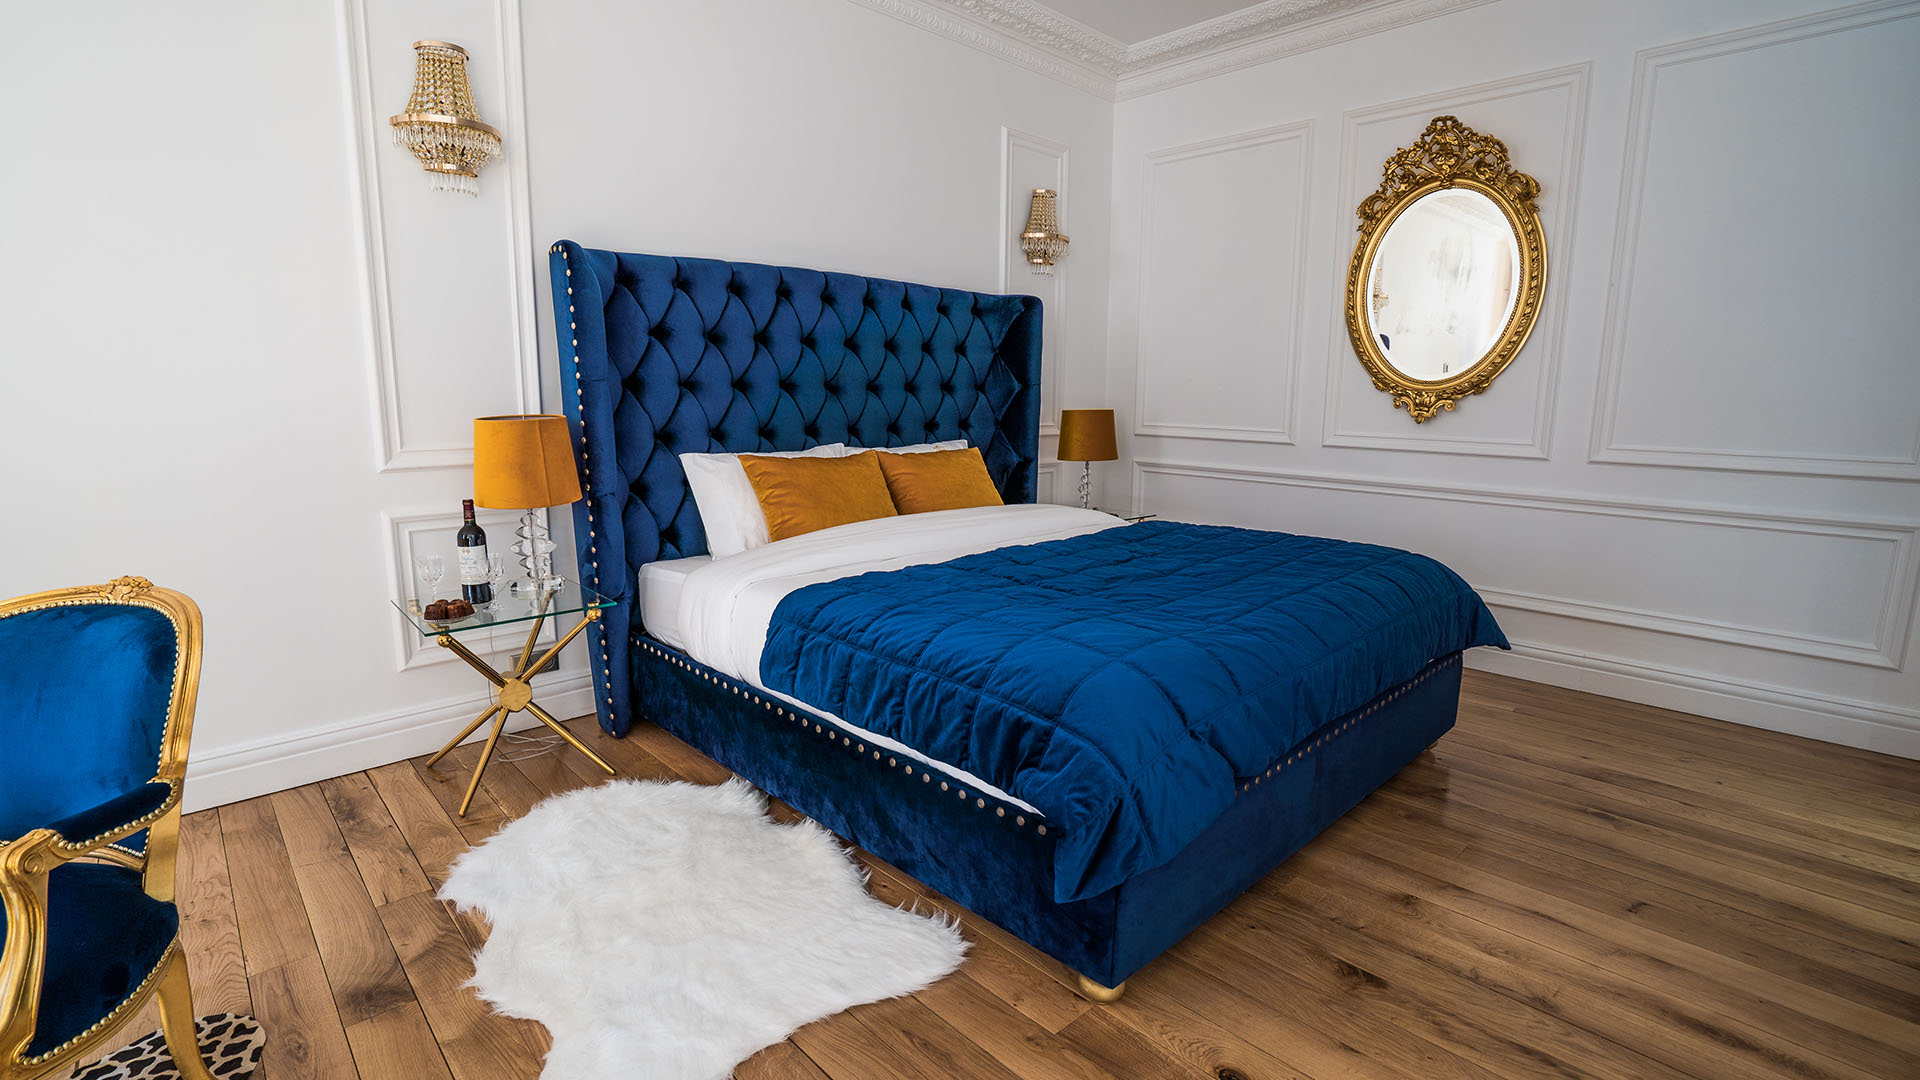 Chambre d'hotes - Château grand Arnaud Bordeaux